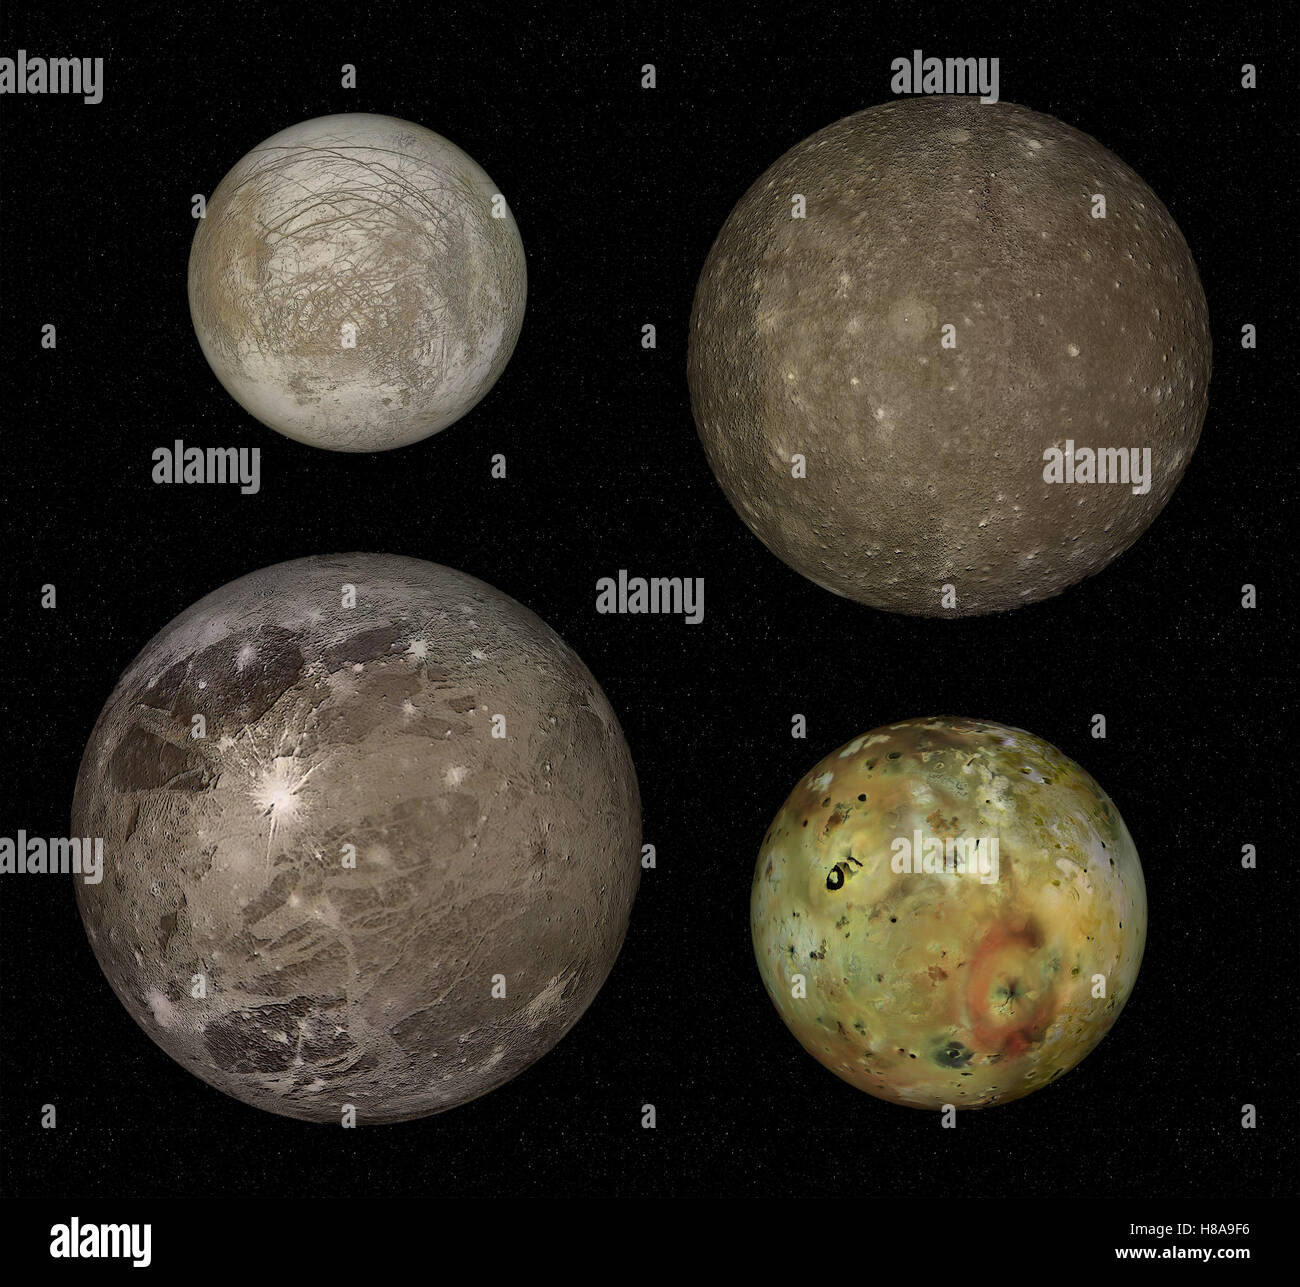 four biggest moons of Jupiter, real comparison, on black background - Stock Image